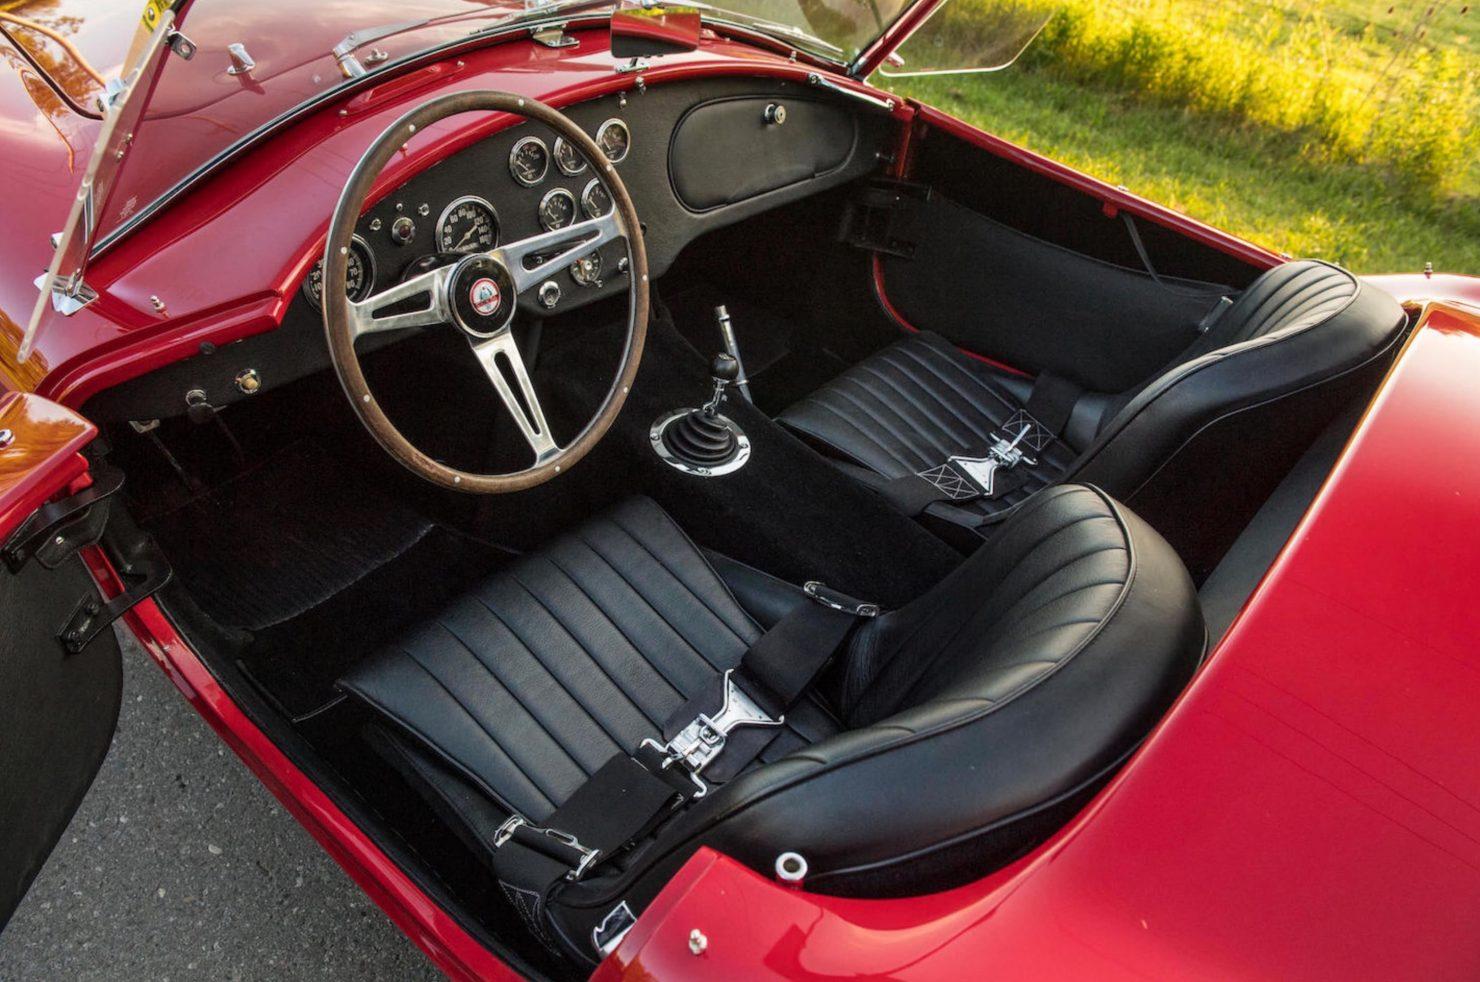 shelby ac cobra 289 19 1480x982 - 1964 Shelby AC Cobra 289